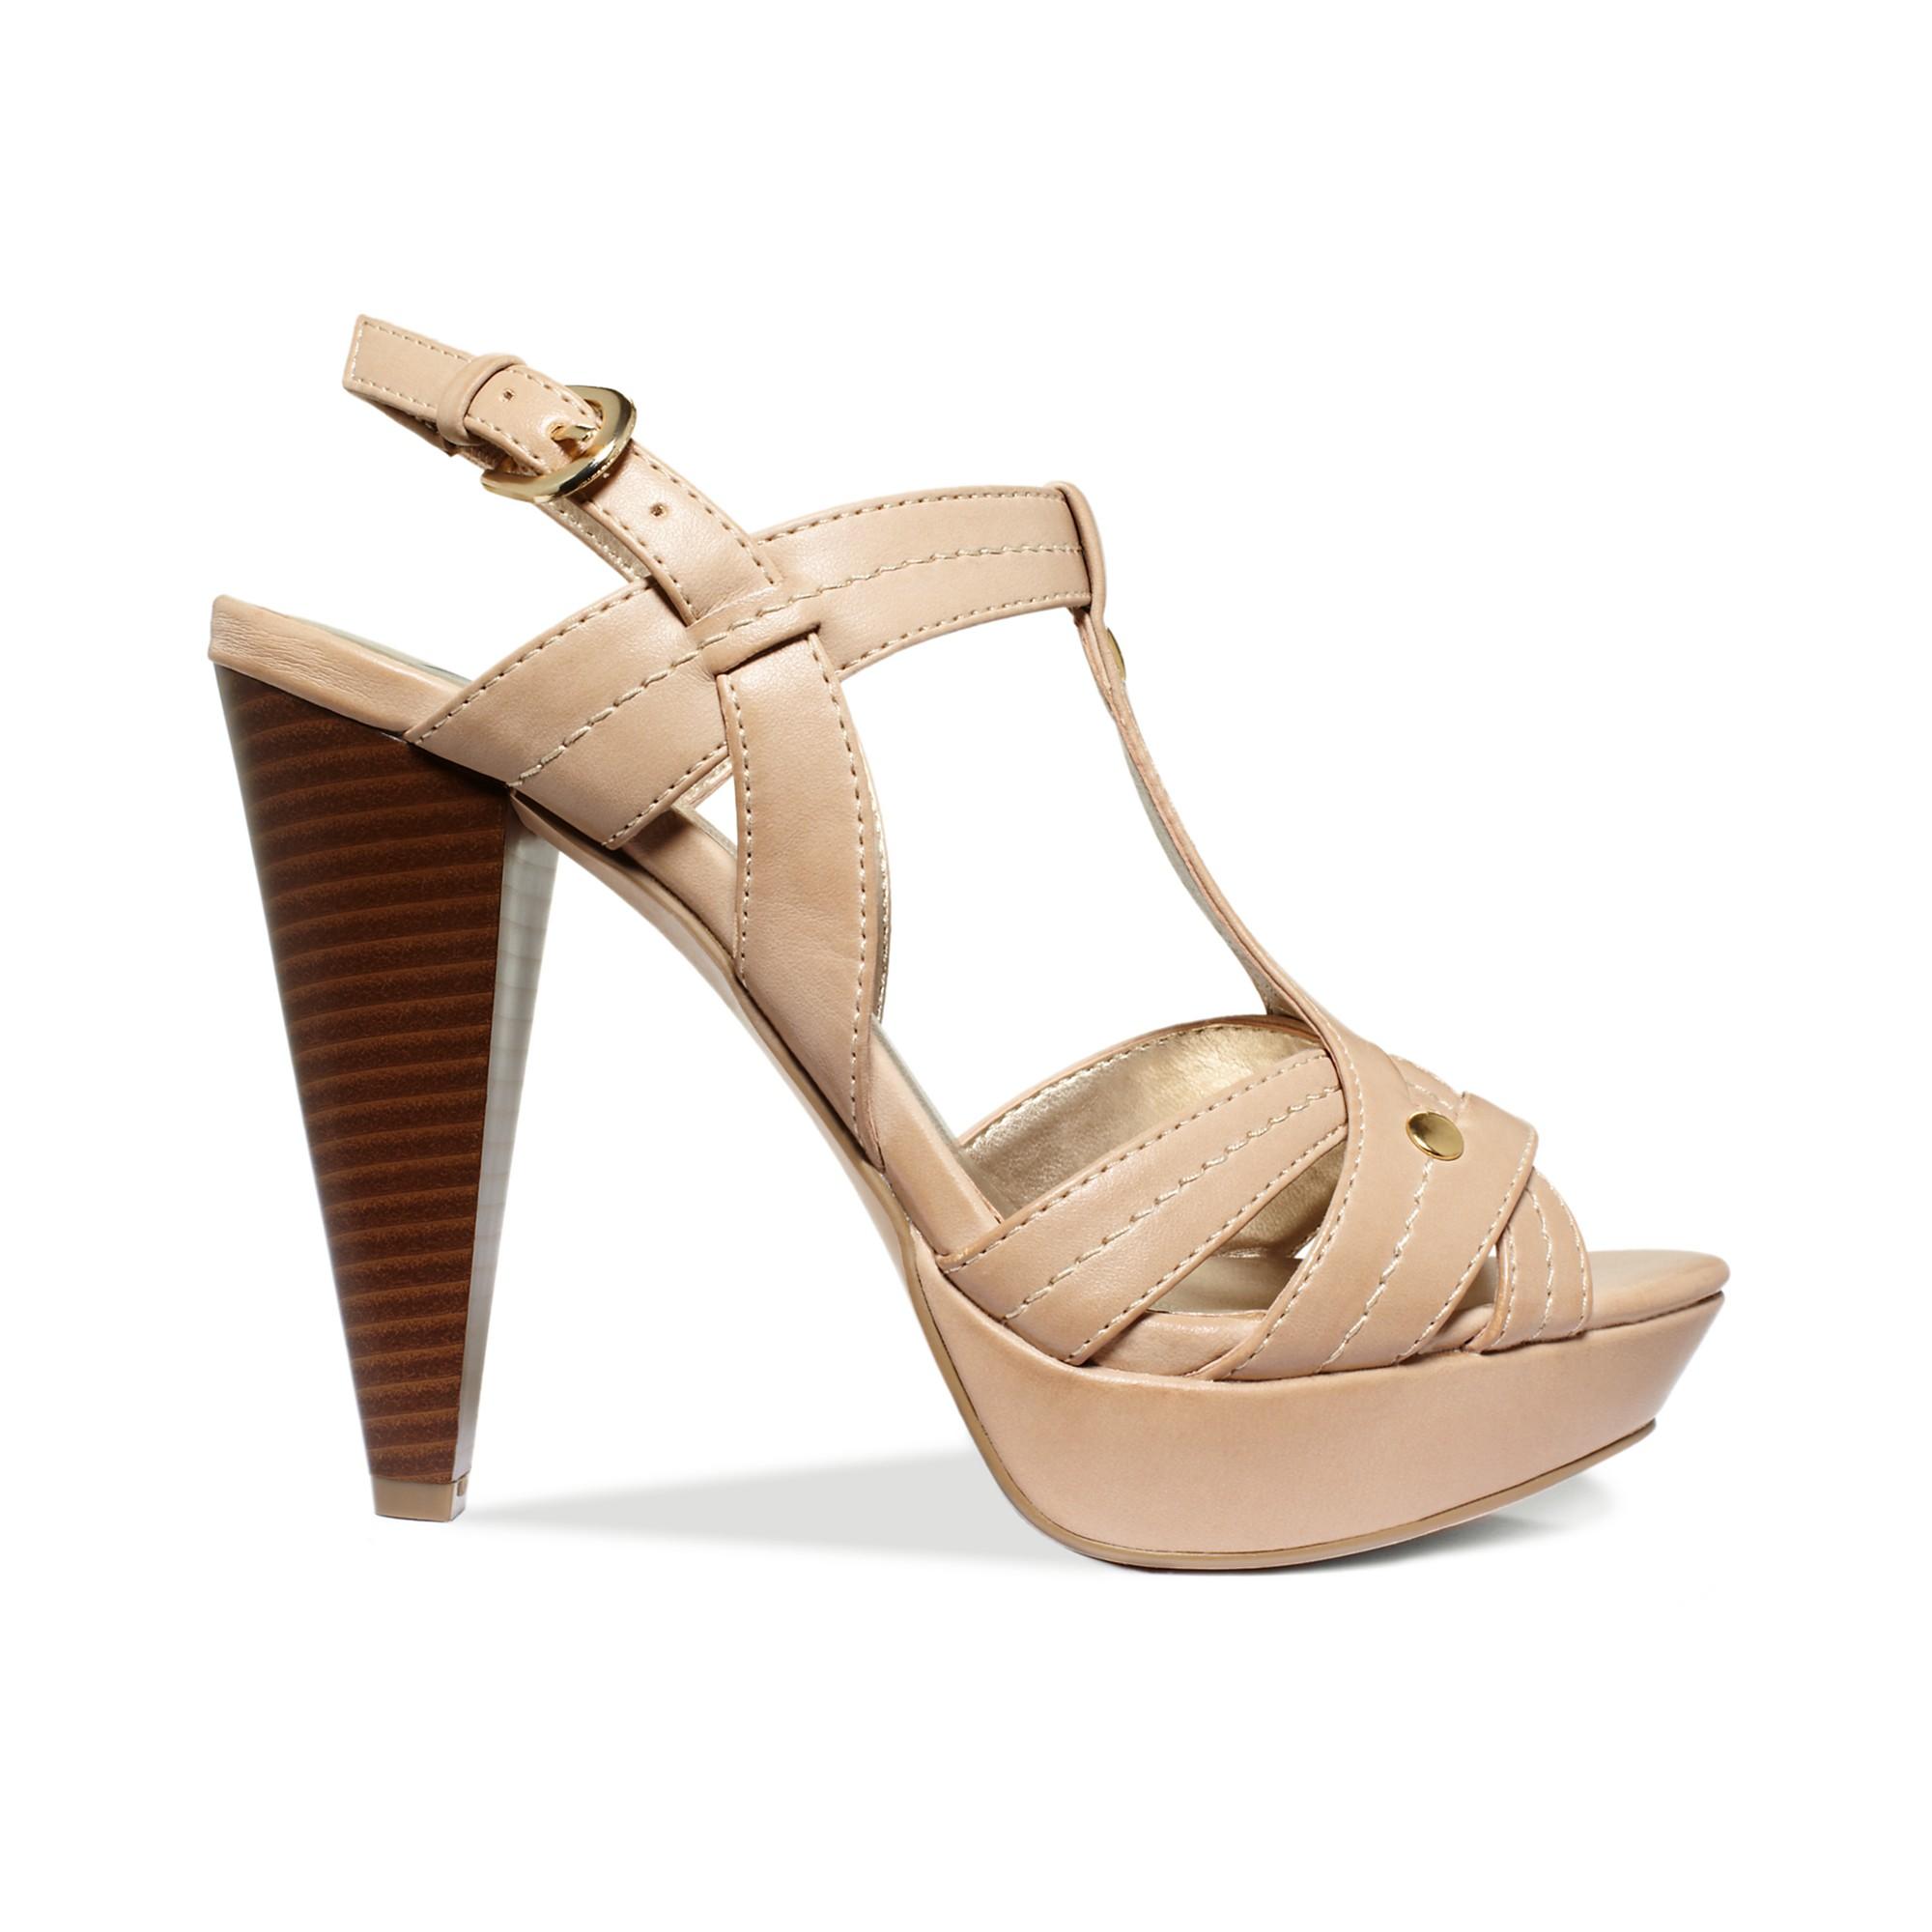 7e7a406182e G by Guess Brown Heather Platform Sandals